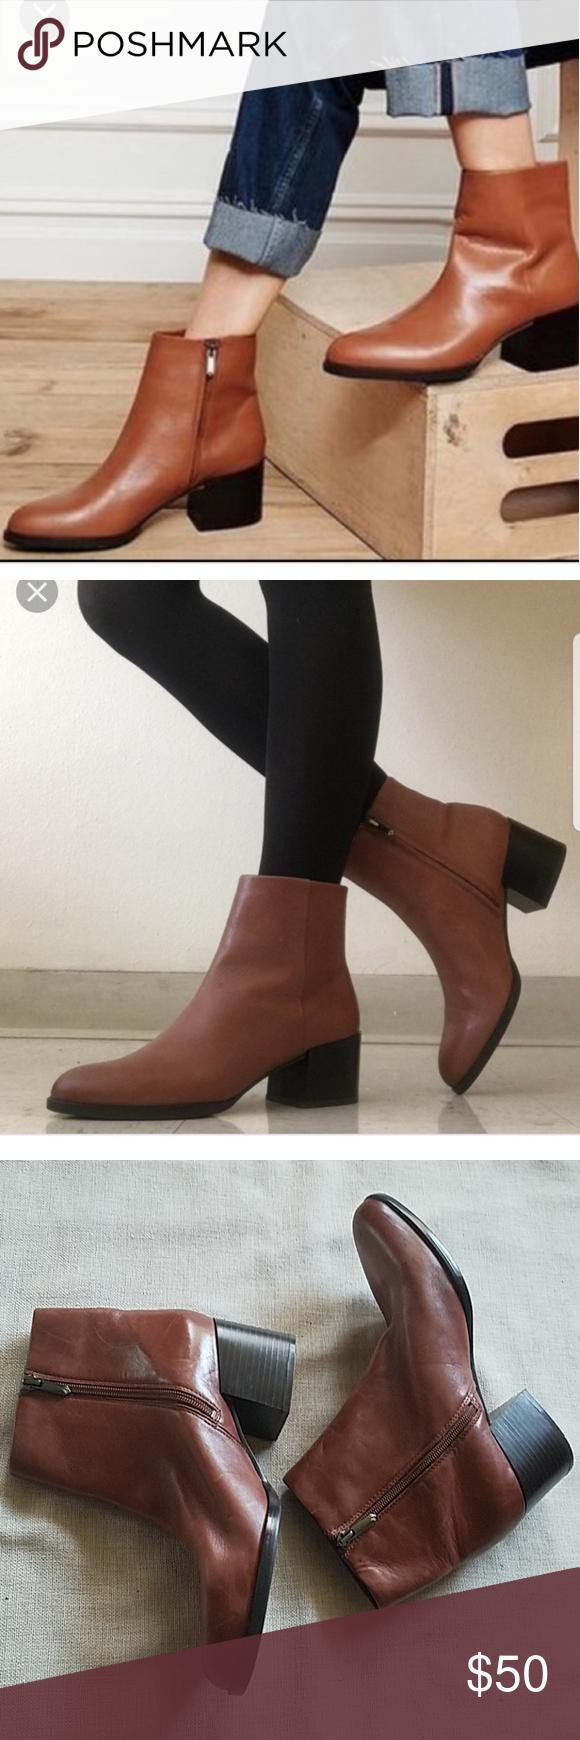 259818b00a7fa Sam Edelman Bootie⚘💖 Zam Edelman- Joey Bootie Modena calf leather Rubber  sole Shaft